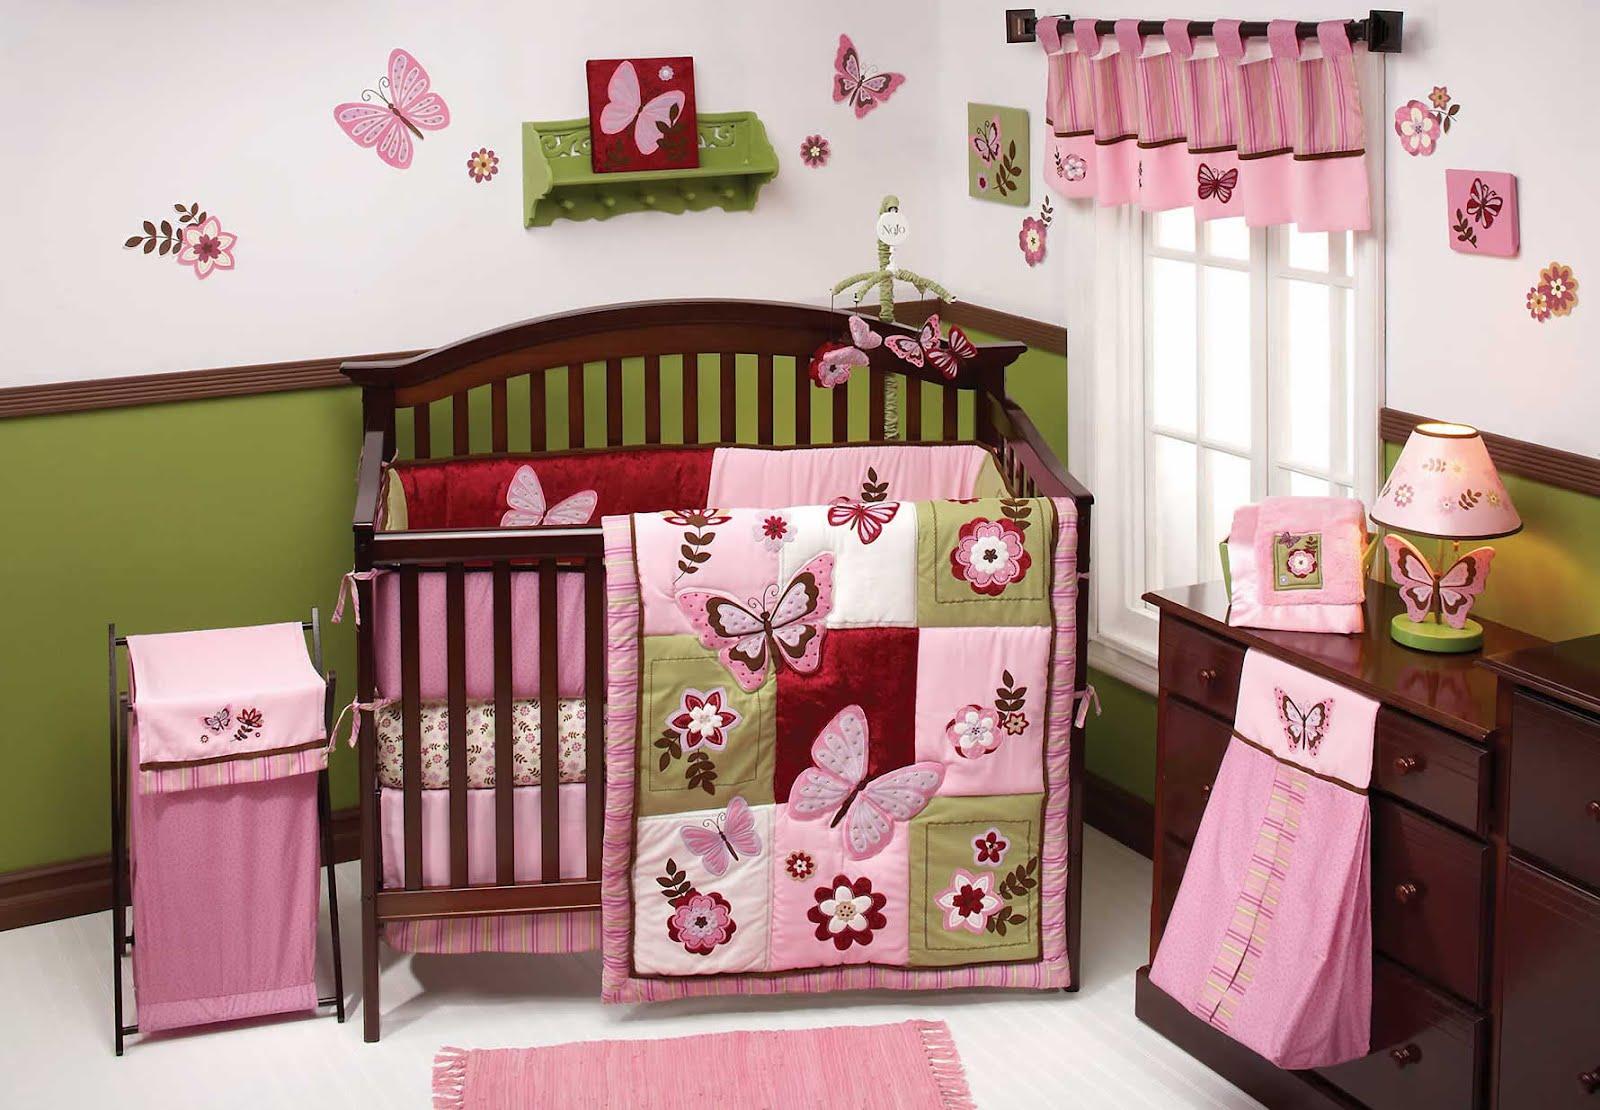 Baby Bedding | Best Baby Decoration